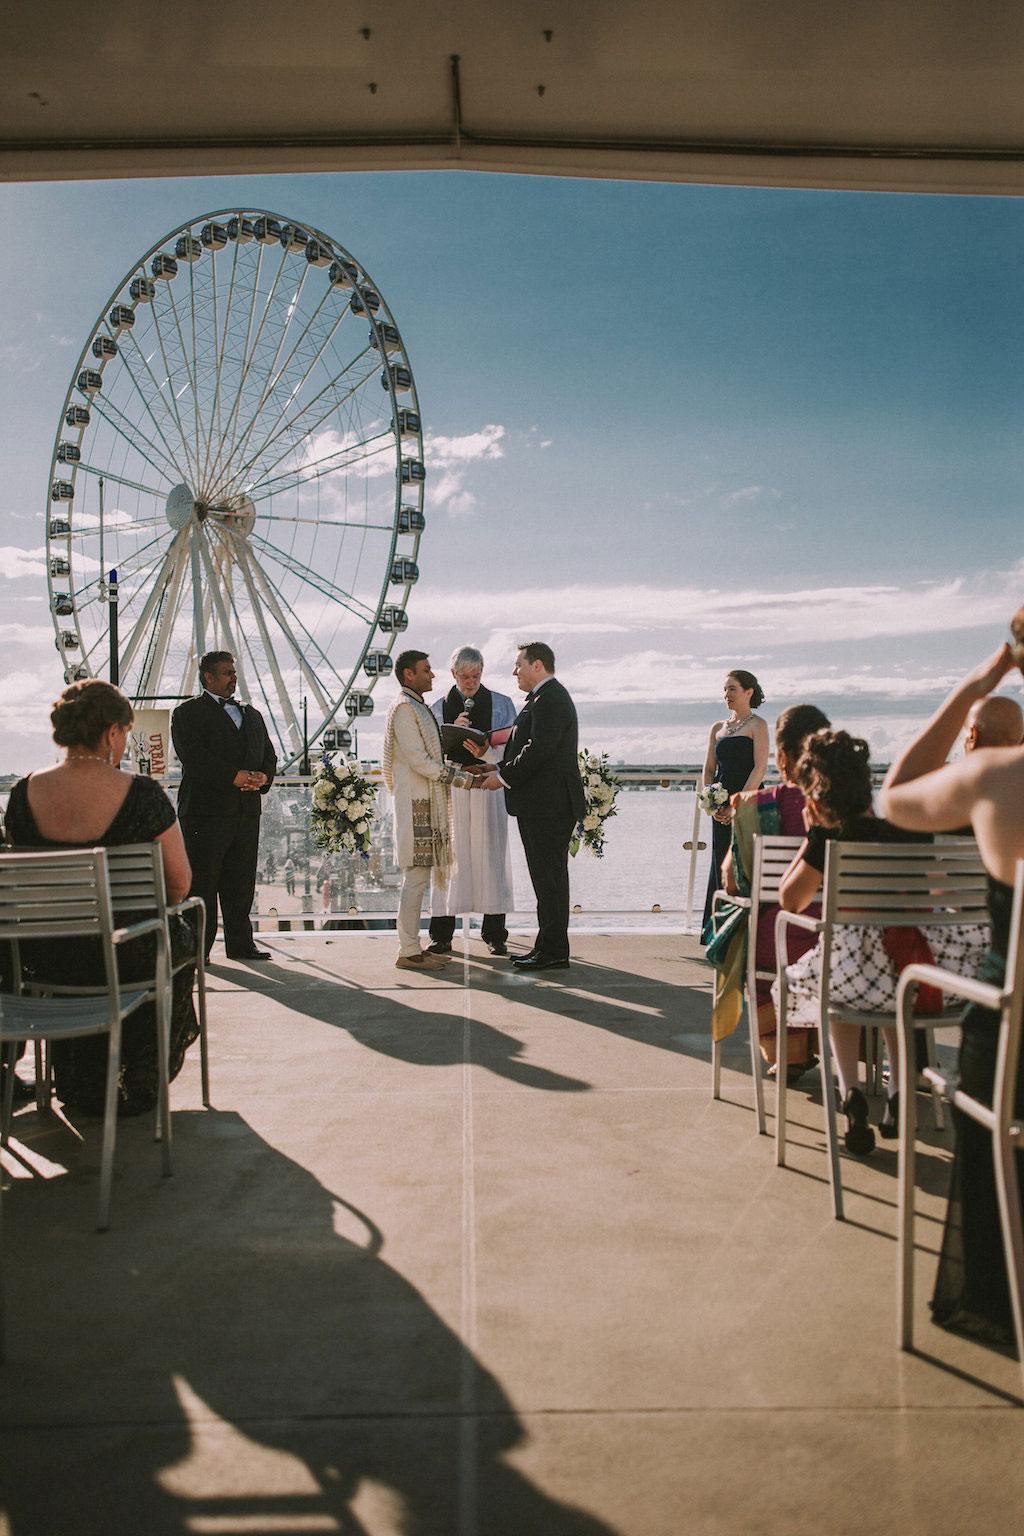 8-22-16-national-harbor-yacht-wedding-15